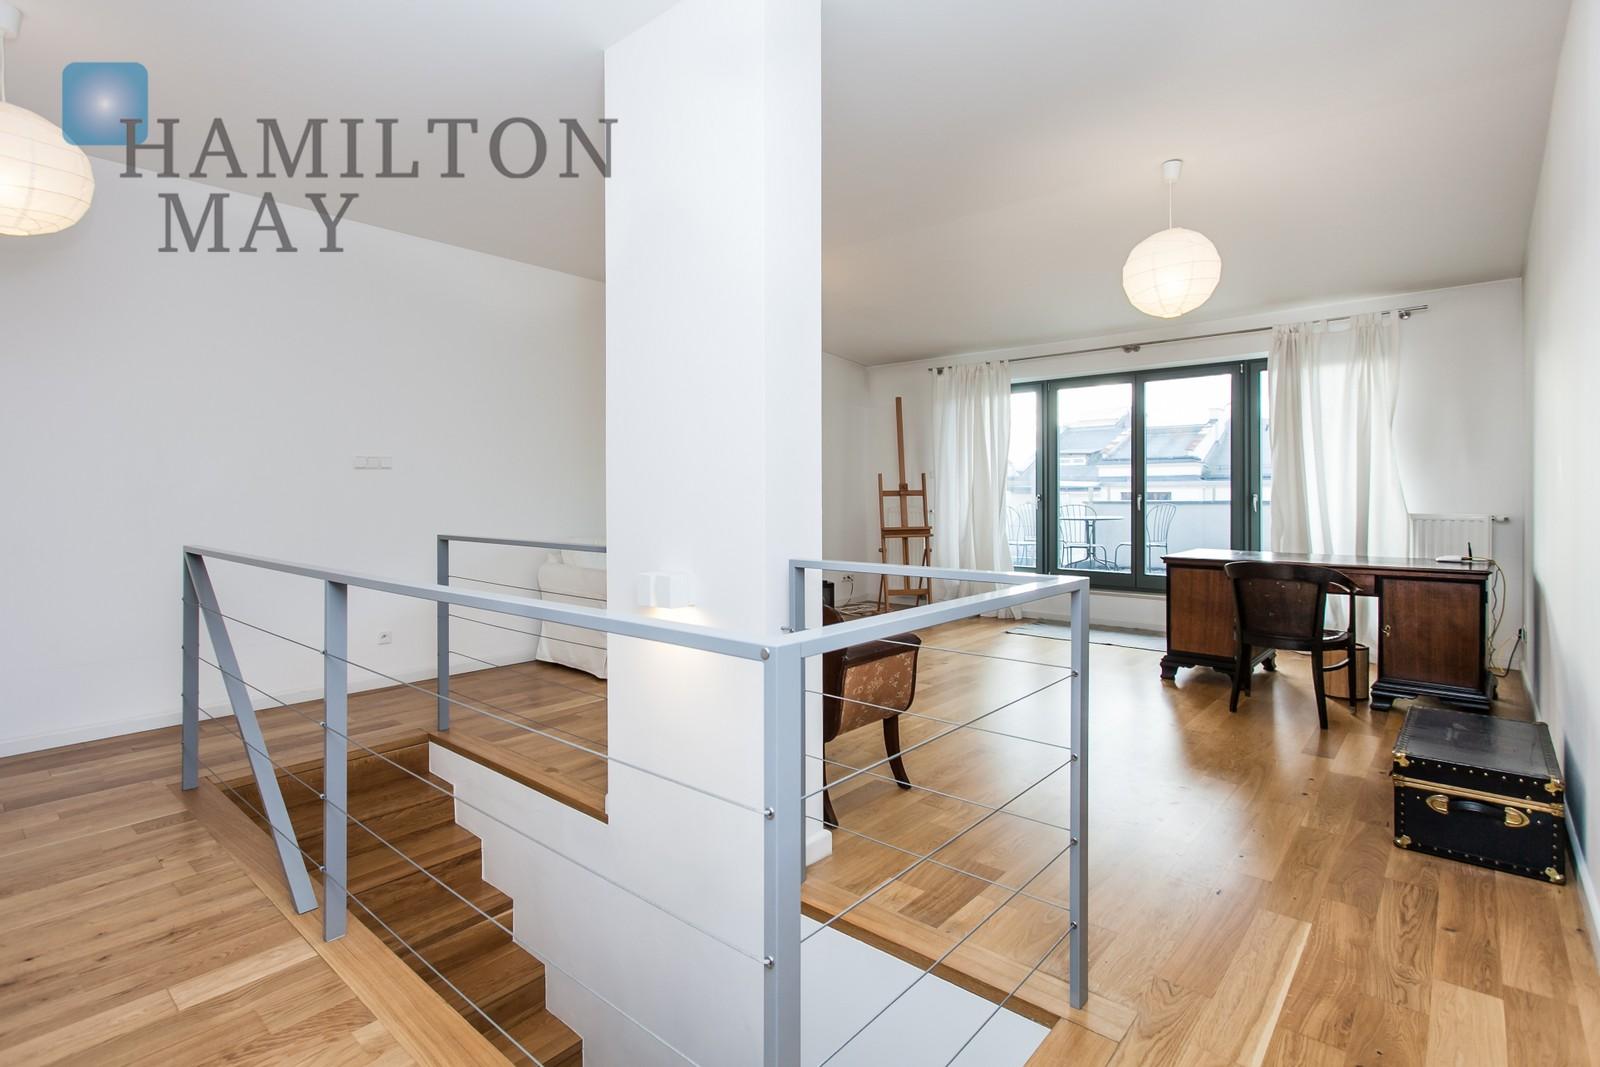 2 bedroom high standard apartment close to the Market Square - ul. Feldmana Krakow for rent